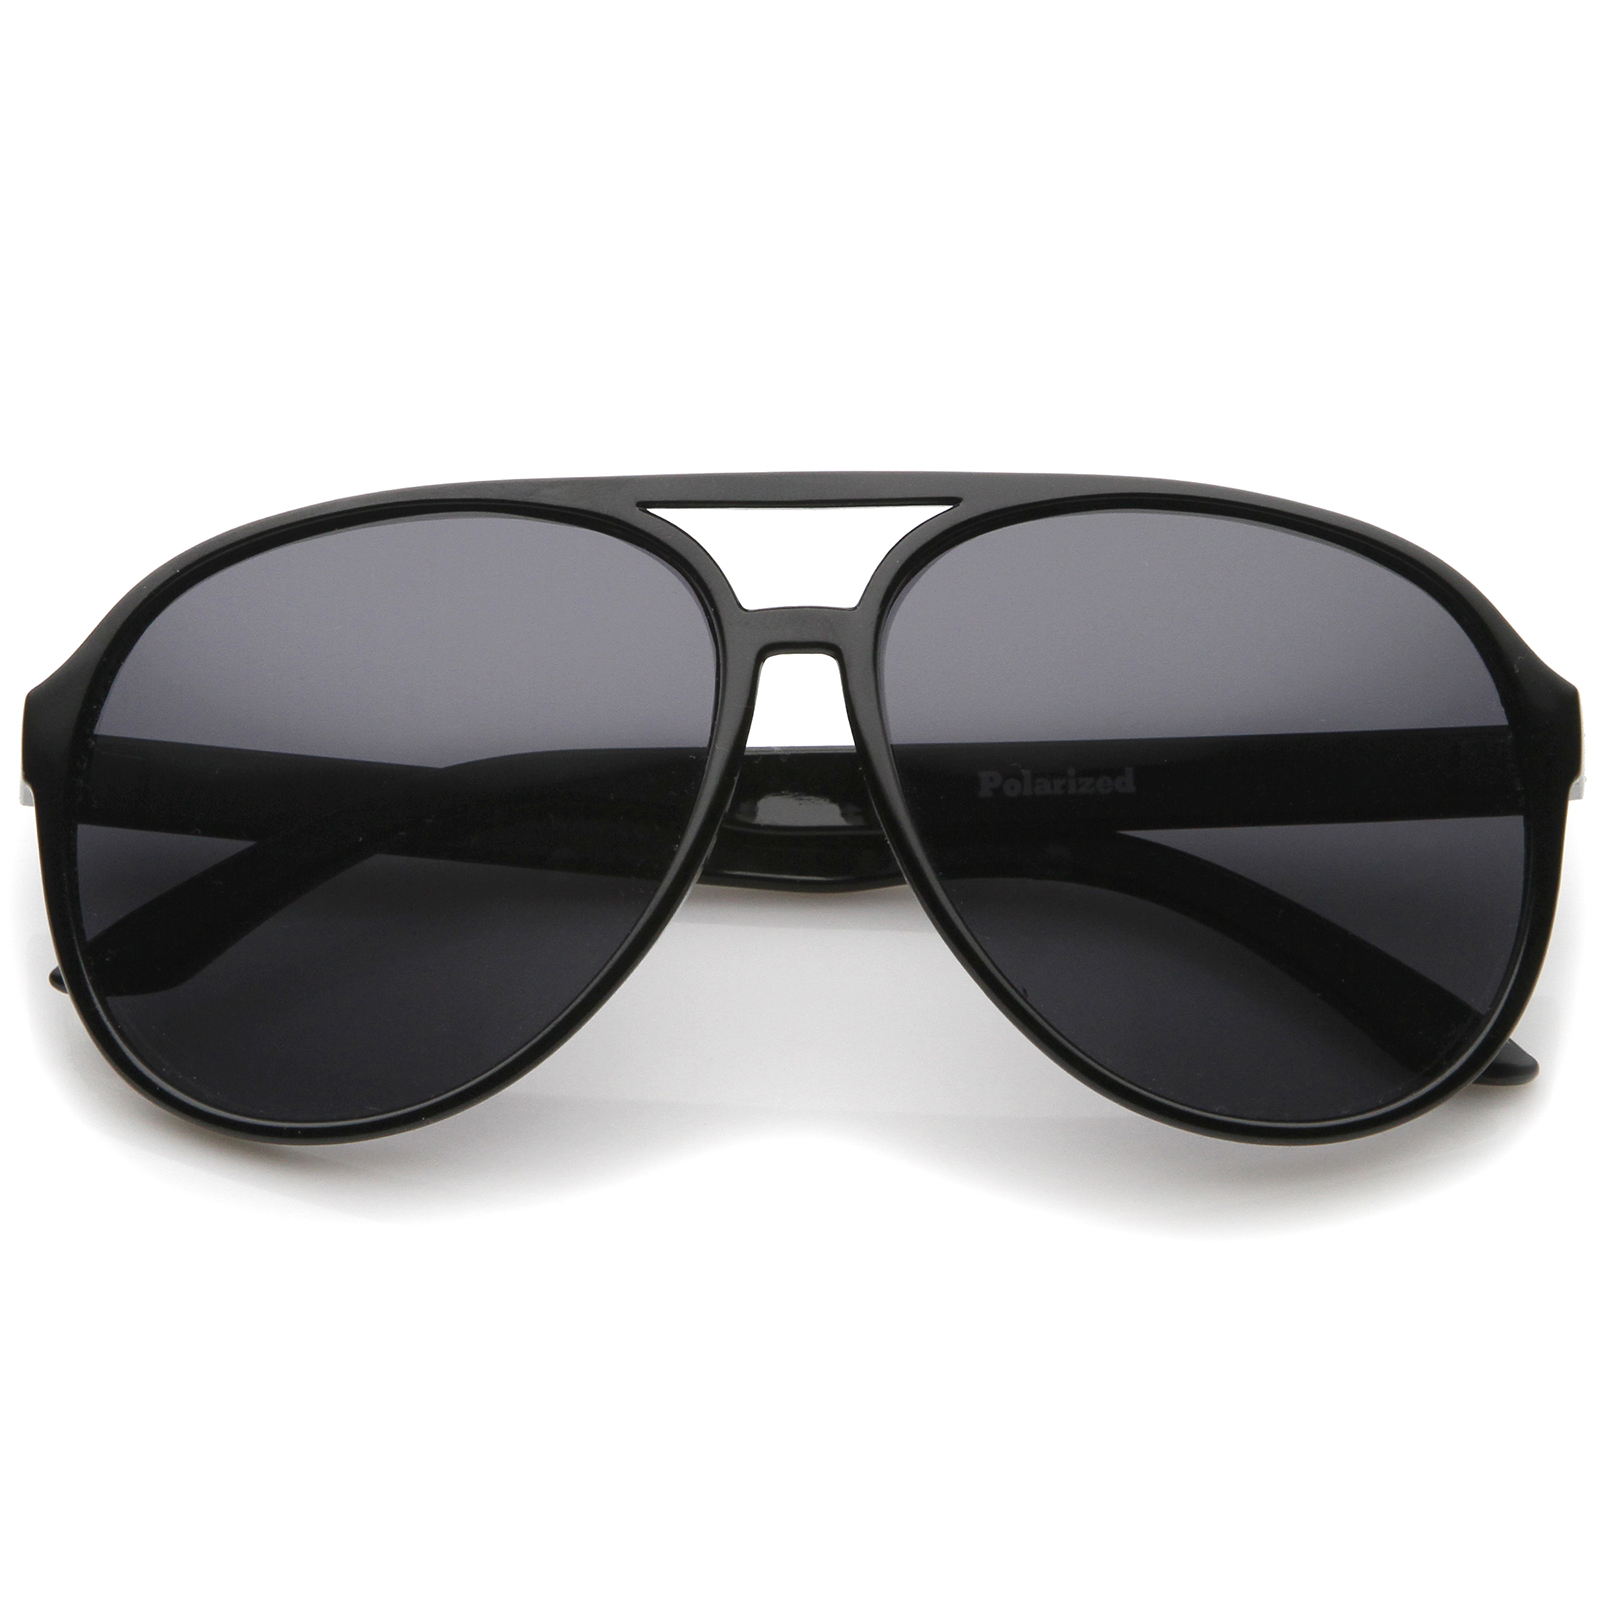 Retro Large Protective Polarized Lens Aviator Sunglasses 60mm (Black / Smoke Polarized)